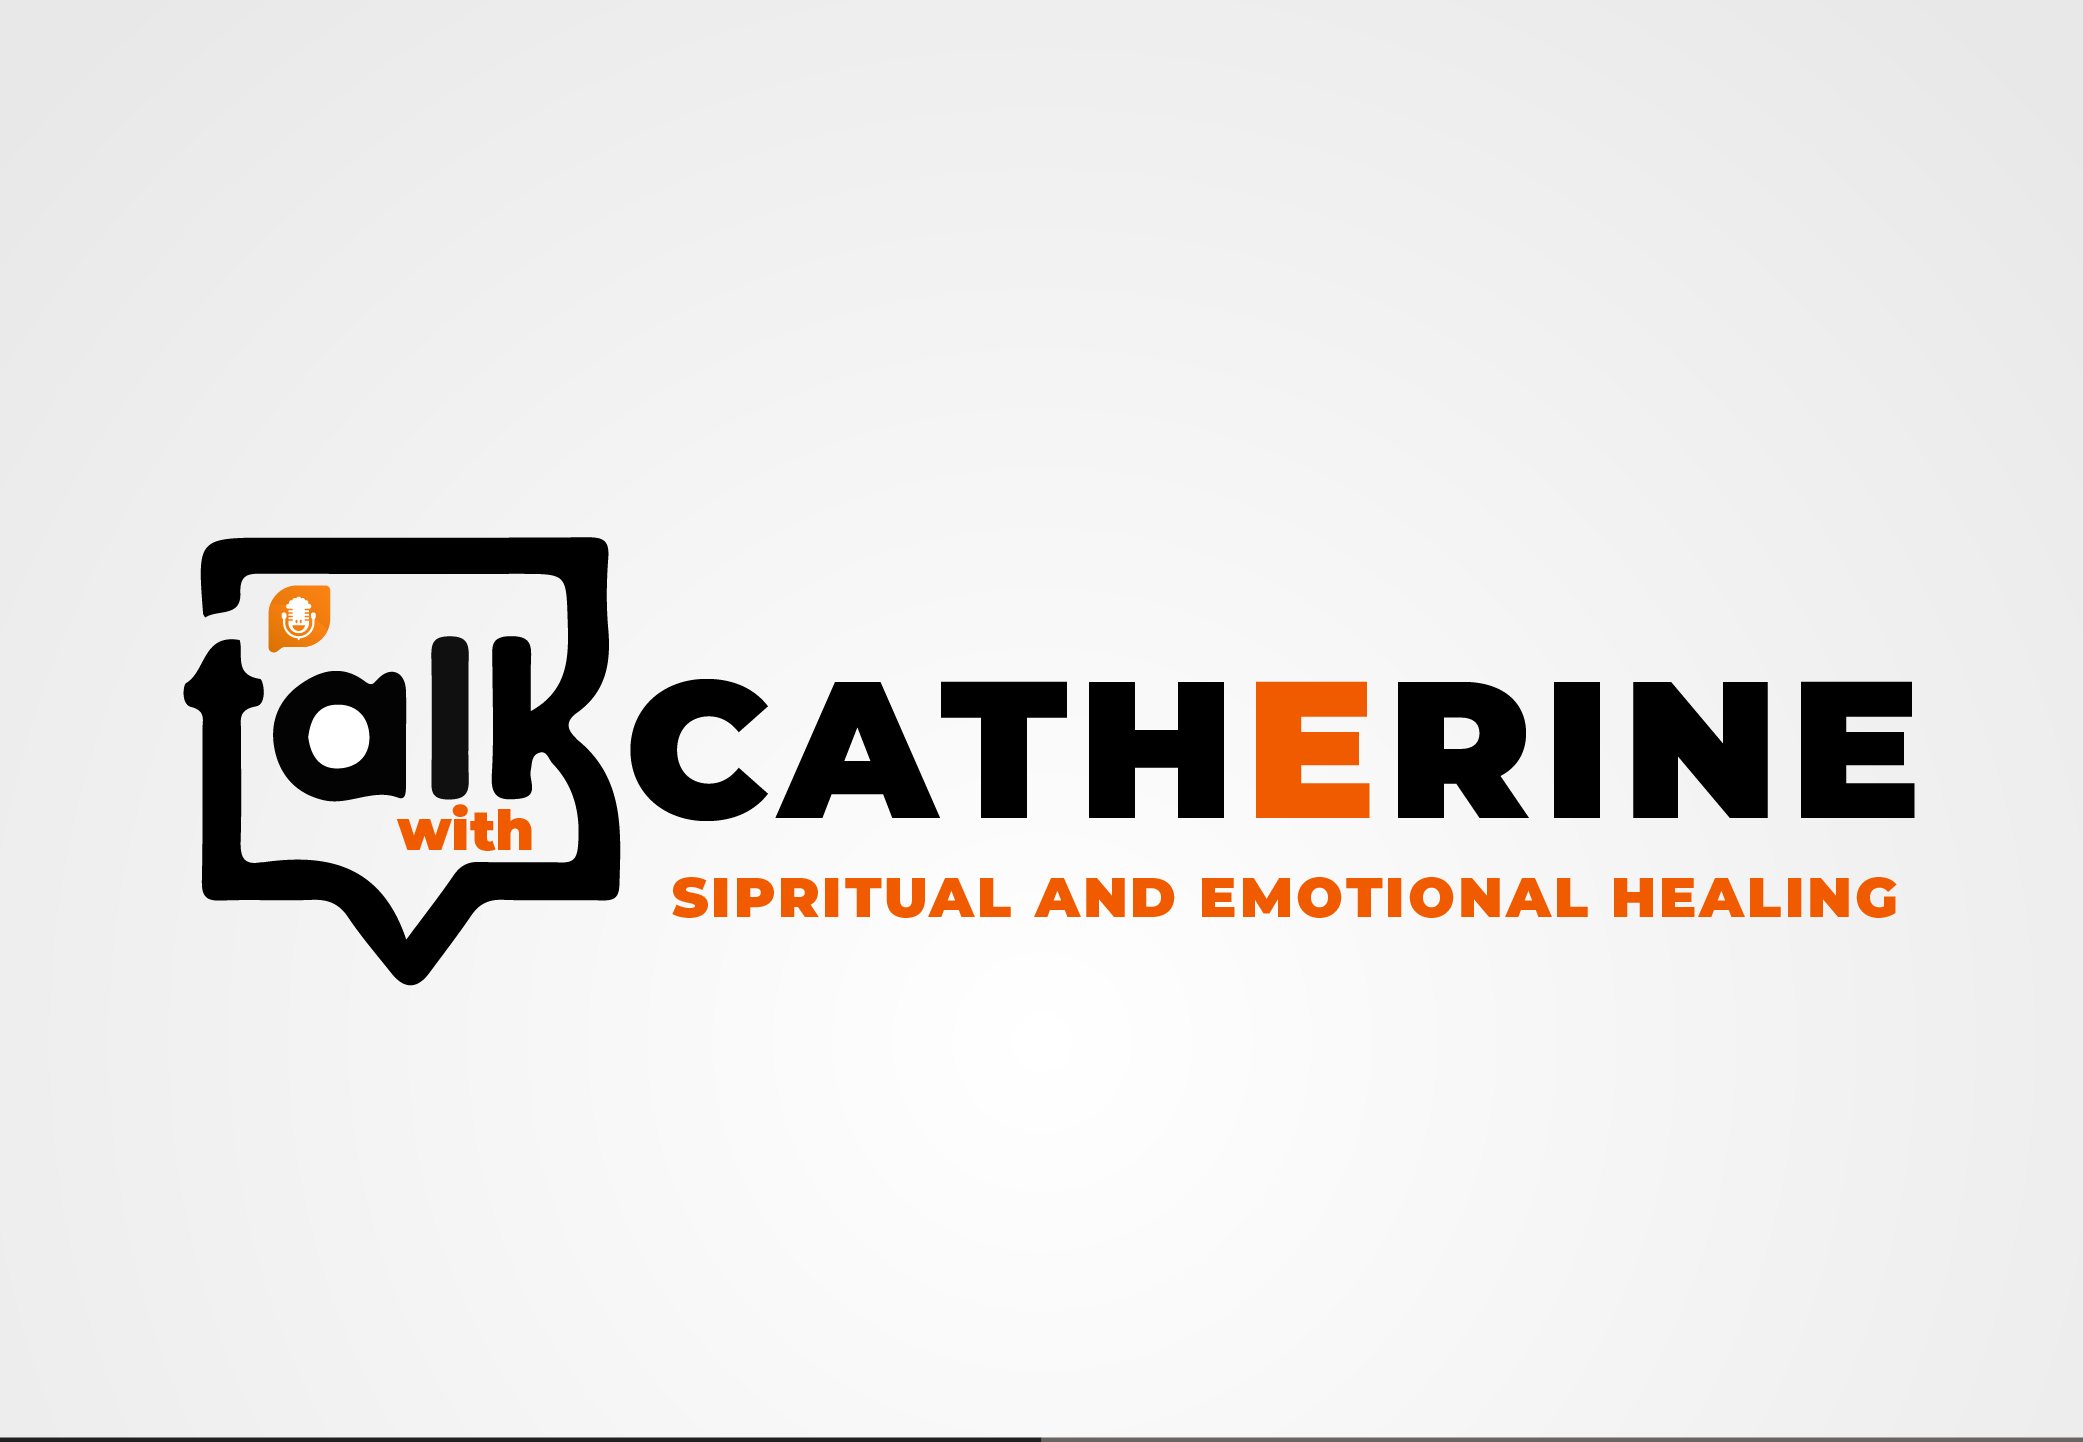 Talk With Catherine